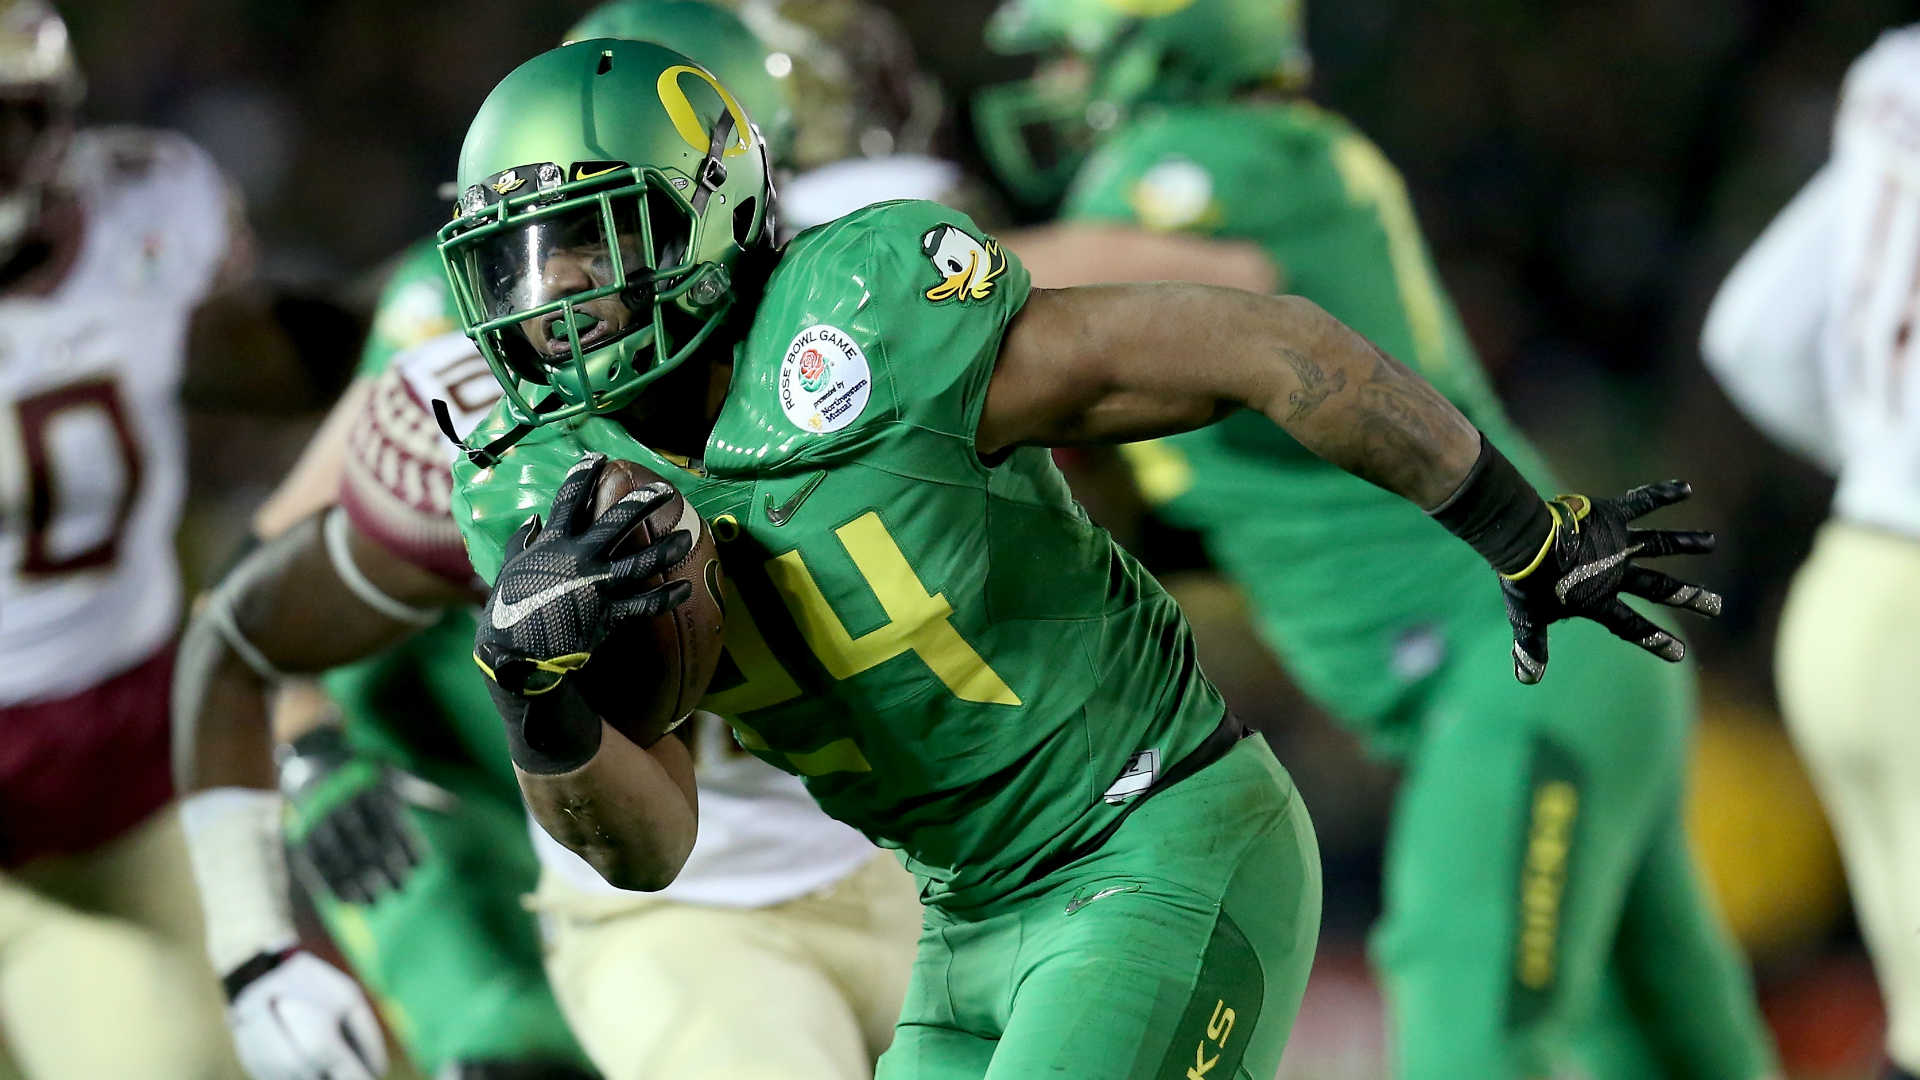 Oregon RB Thomas Tyner